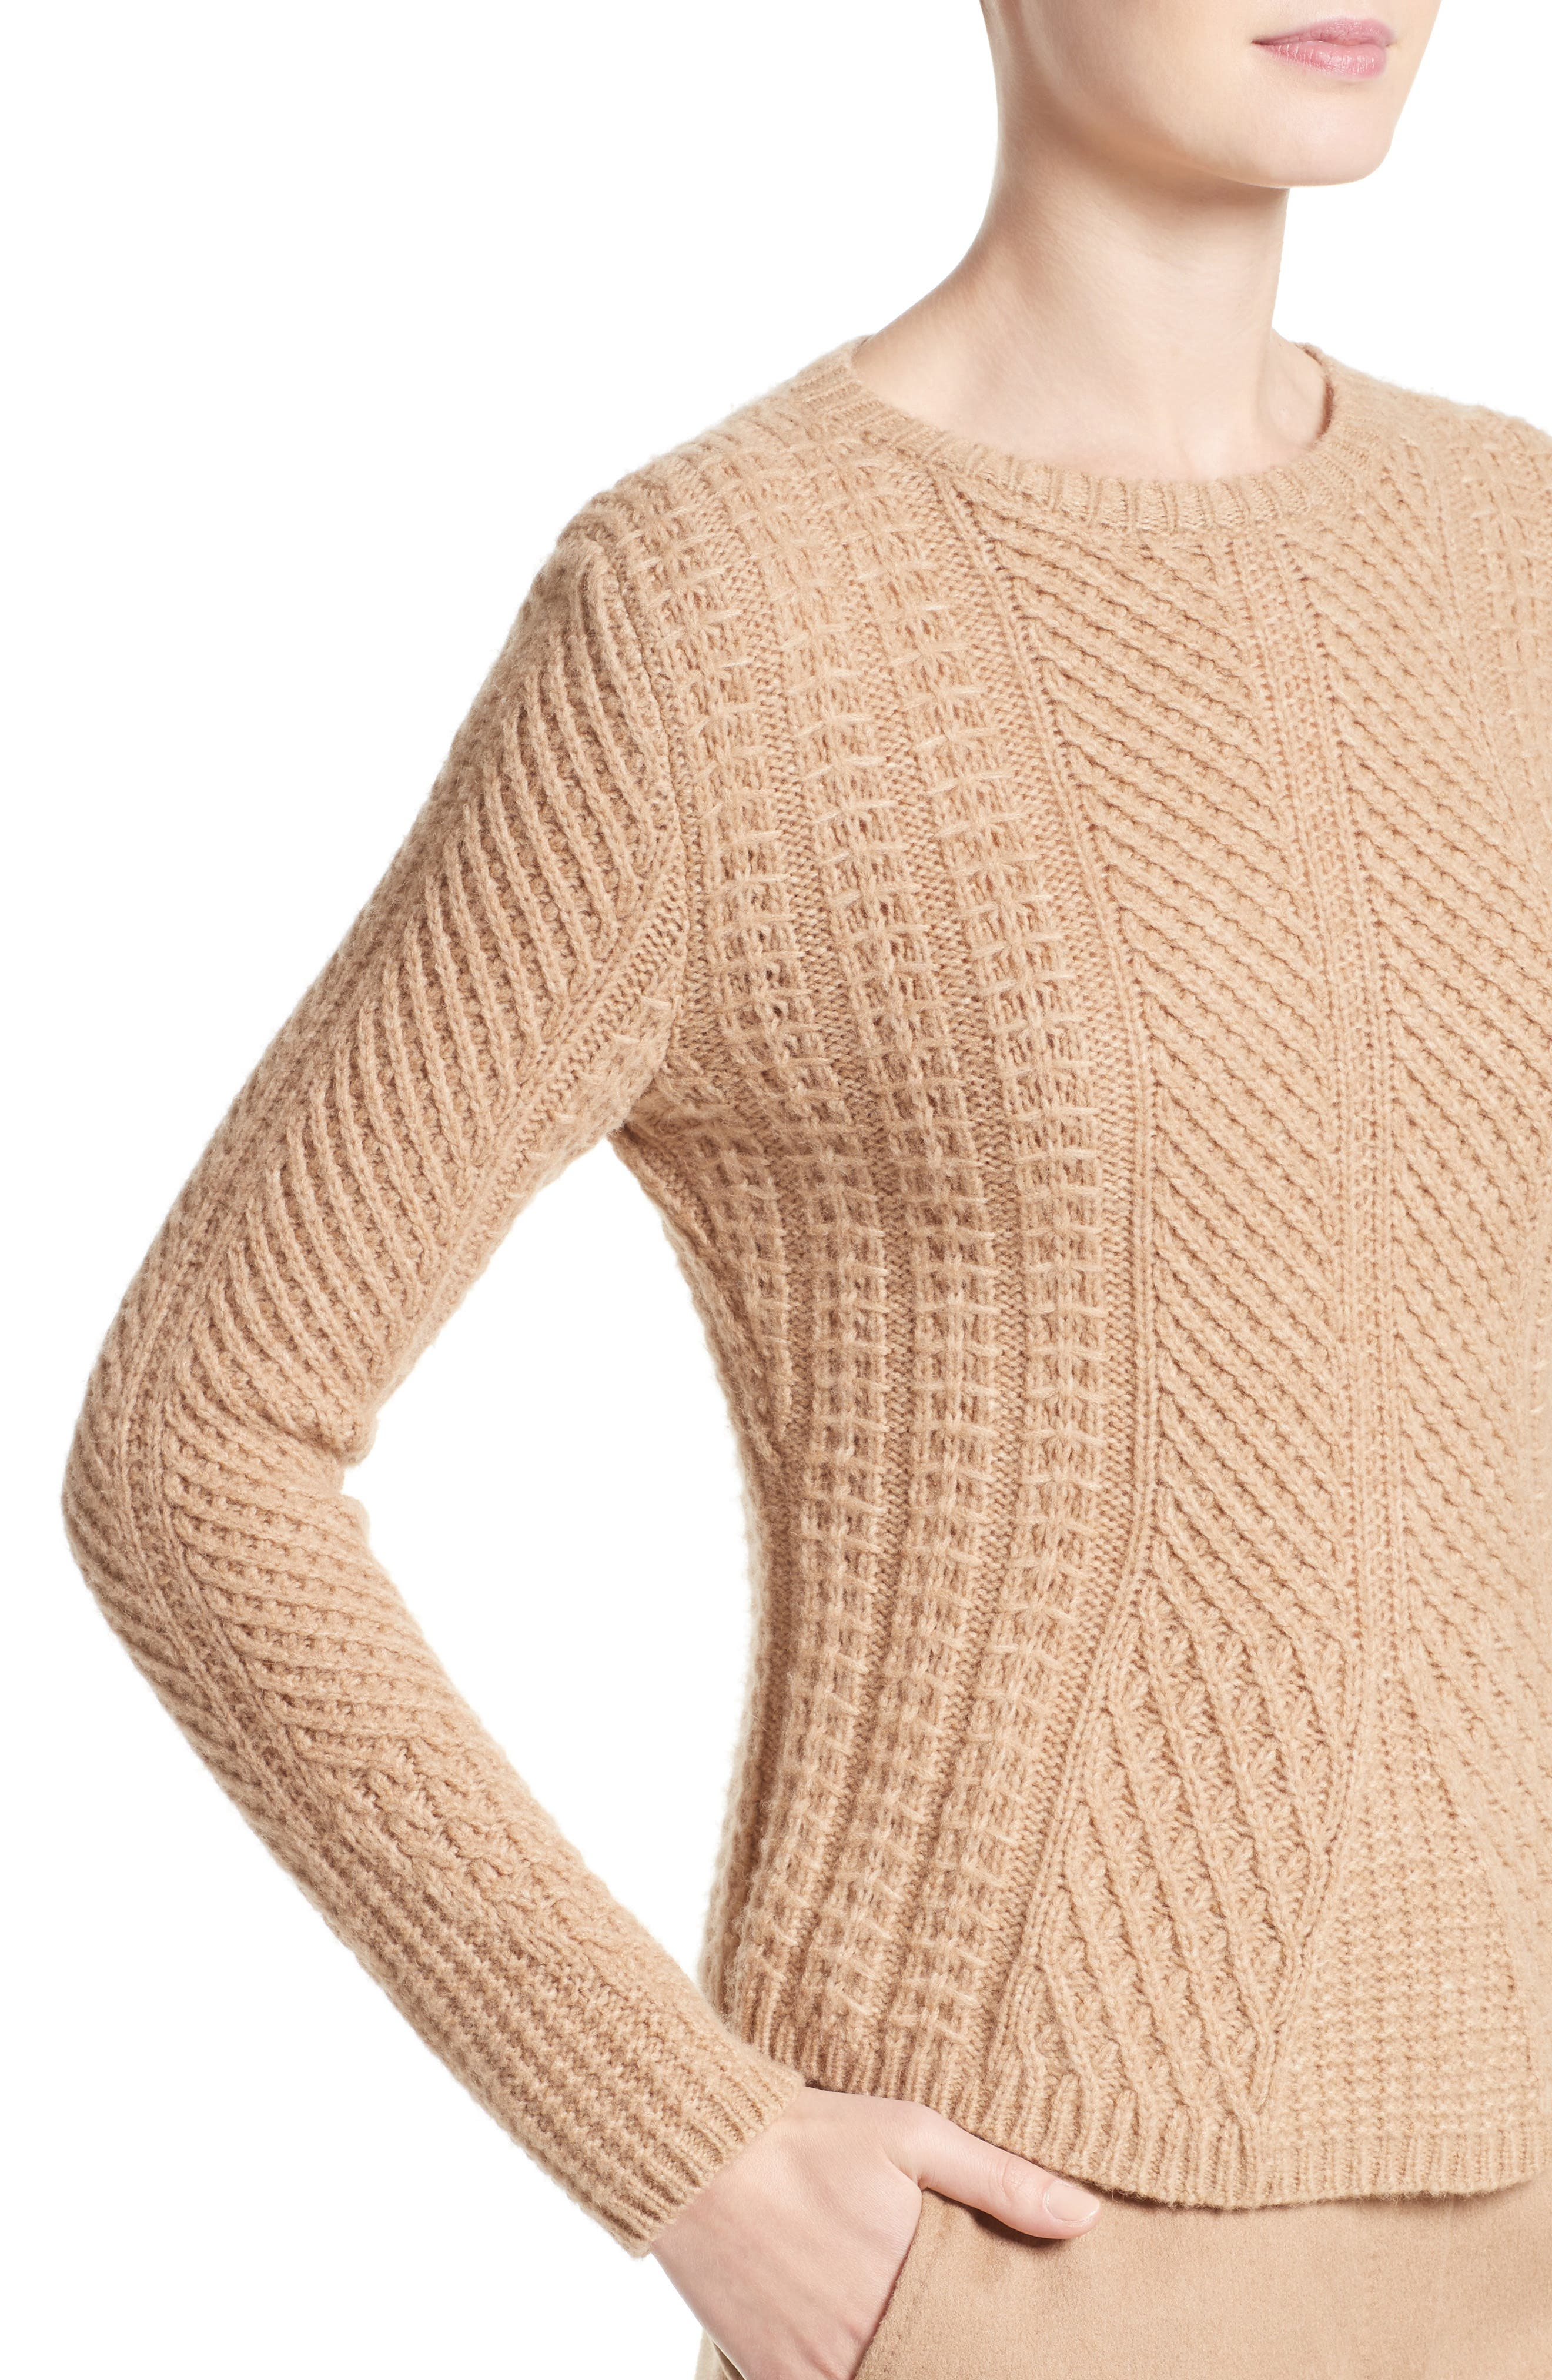 Ronco Sweater,                             Alternate thumbnail 4, color,                             232